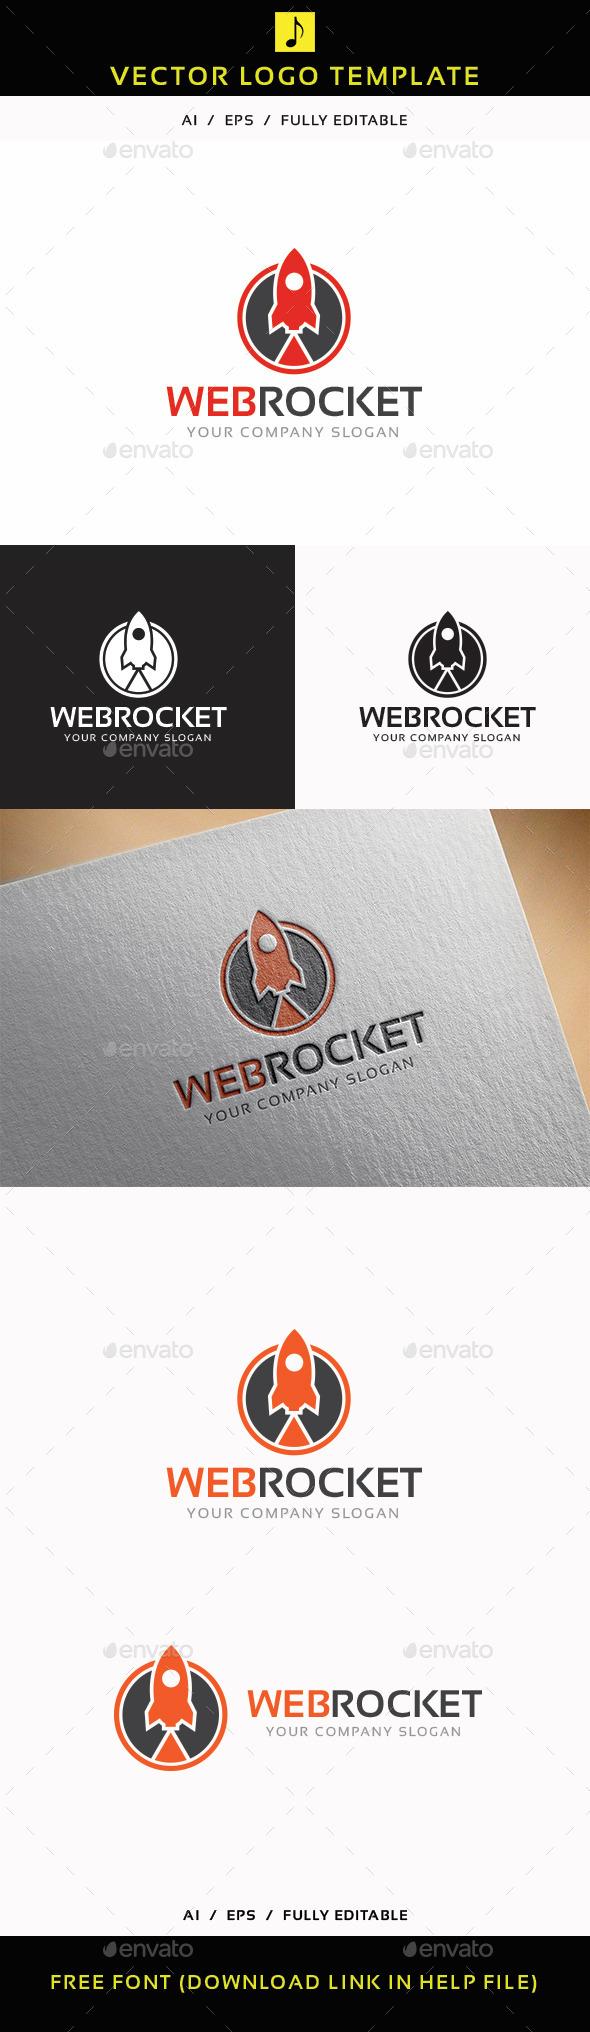 Web Rocket - Objects Logo Templates